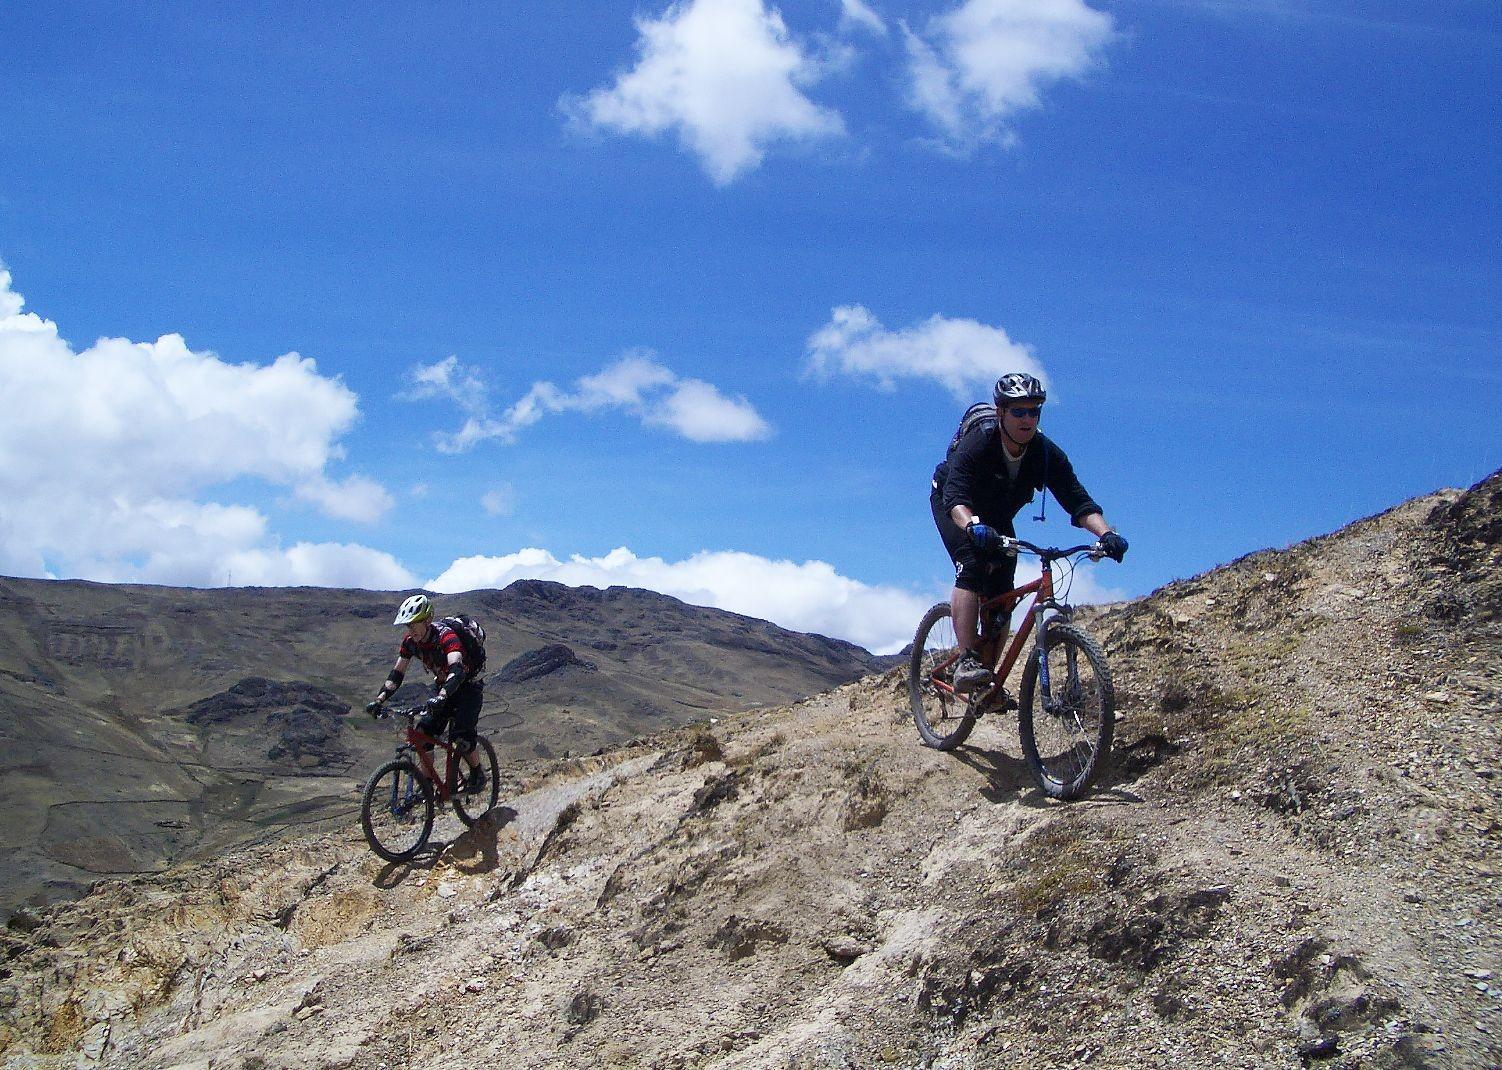 nick peru 2007 (66).jpg - Peru - Sacred Singletrack - Mountain Biking